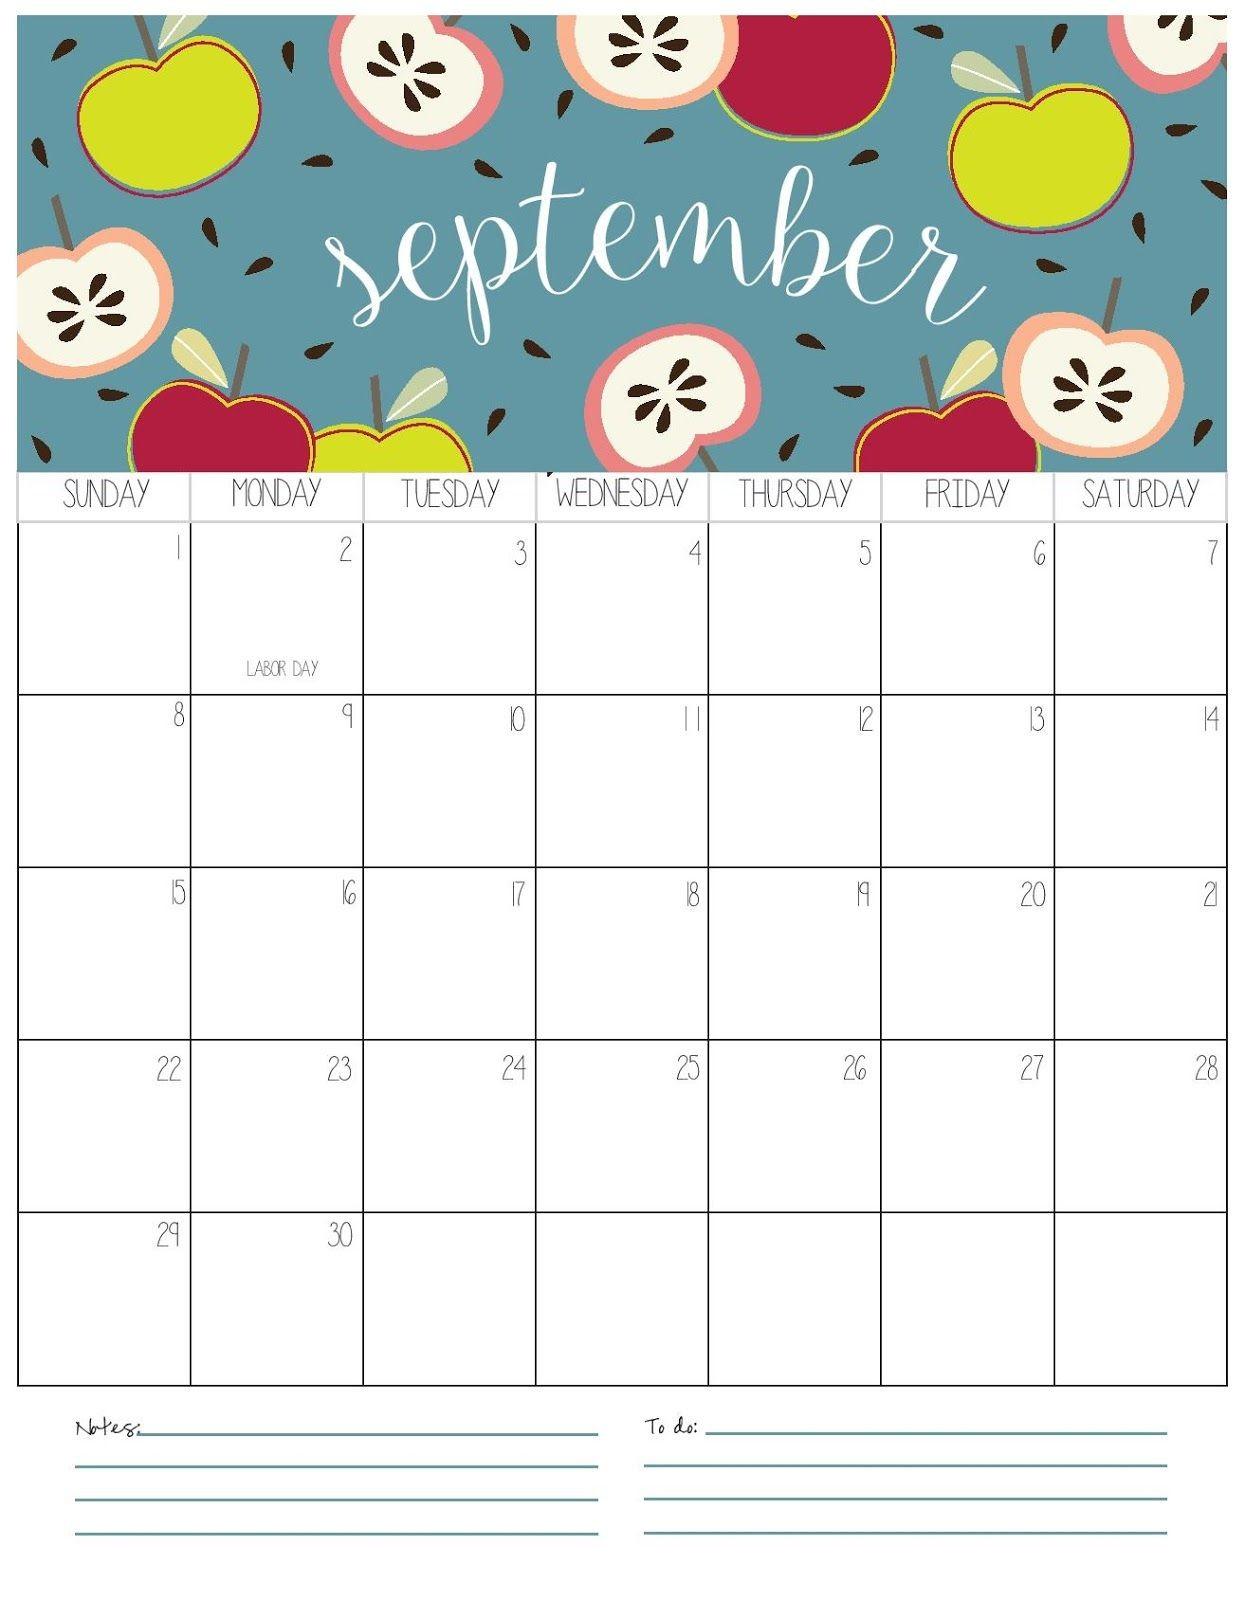 March Calendar 2018 Más Recientes Kalender 2019 Zum Ausdrucken Für Kinder Calenders Of March Calendar 2018 Más Recientes Calendar Template to Print Luxury Chore Chart Unique Chore Calendar